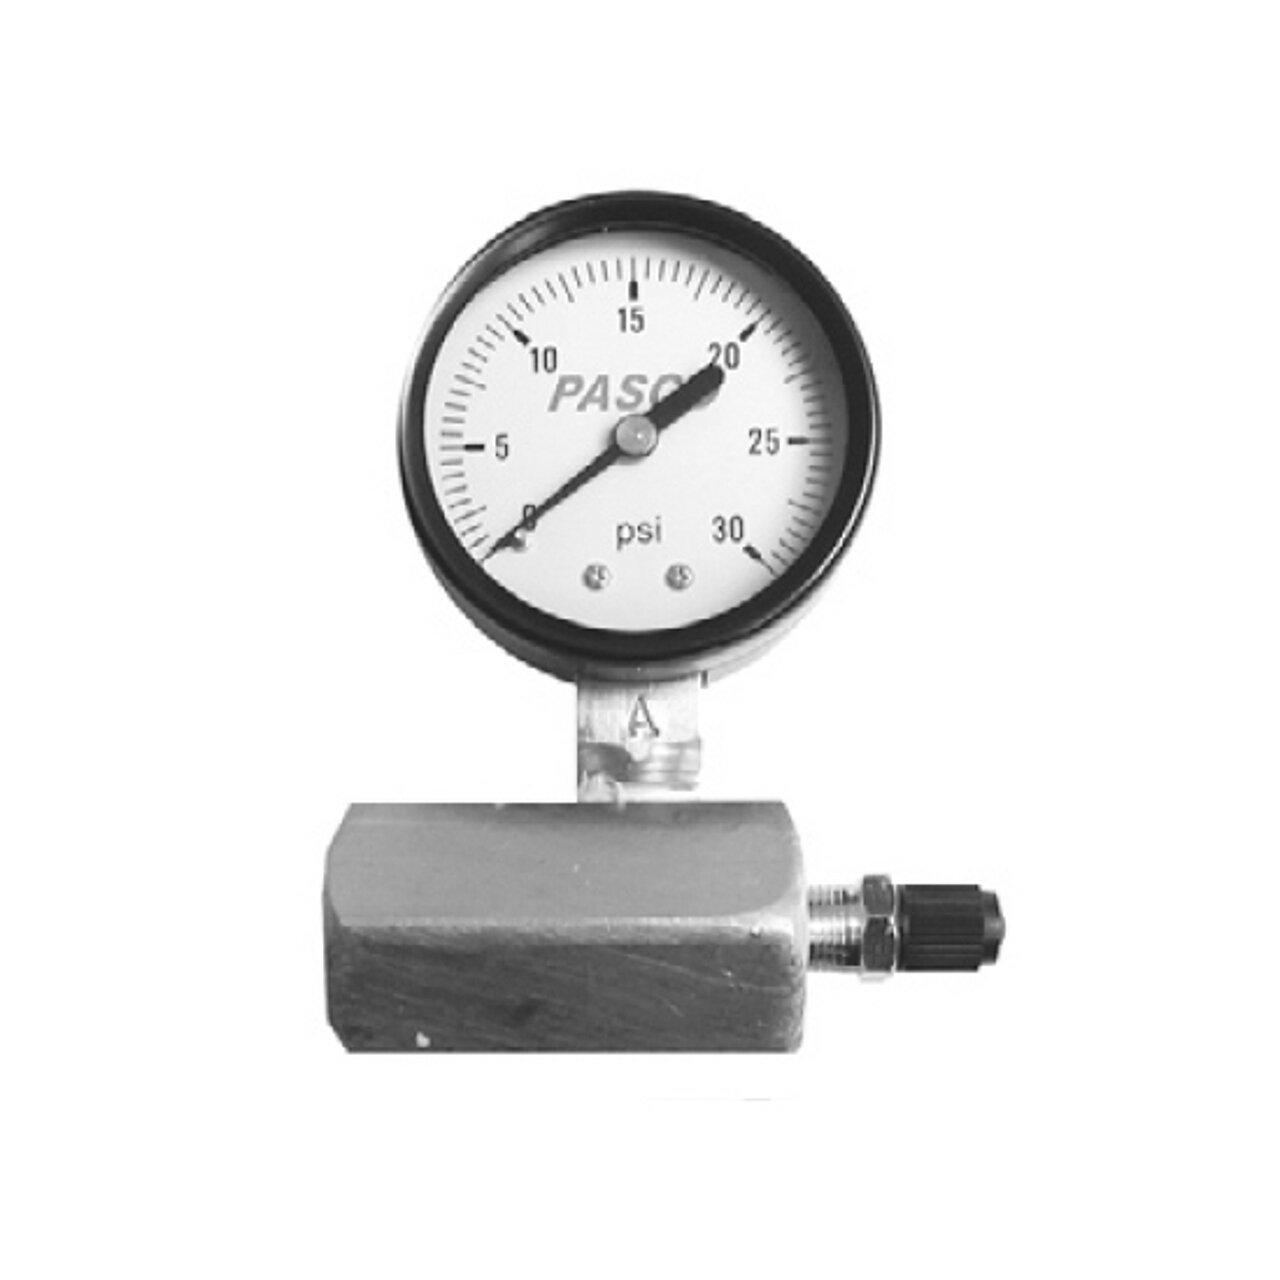 Pasco 1420 60-Pound Gas Test Gauge Assembly